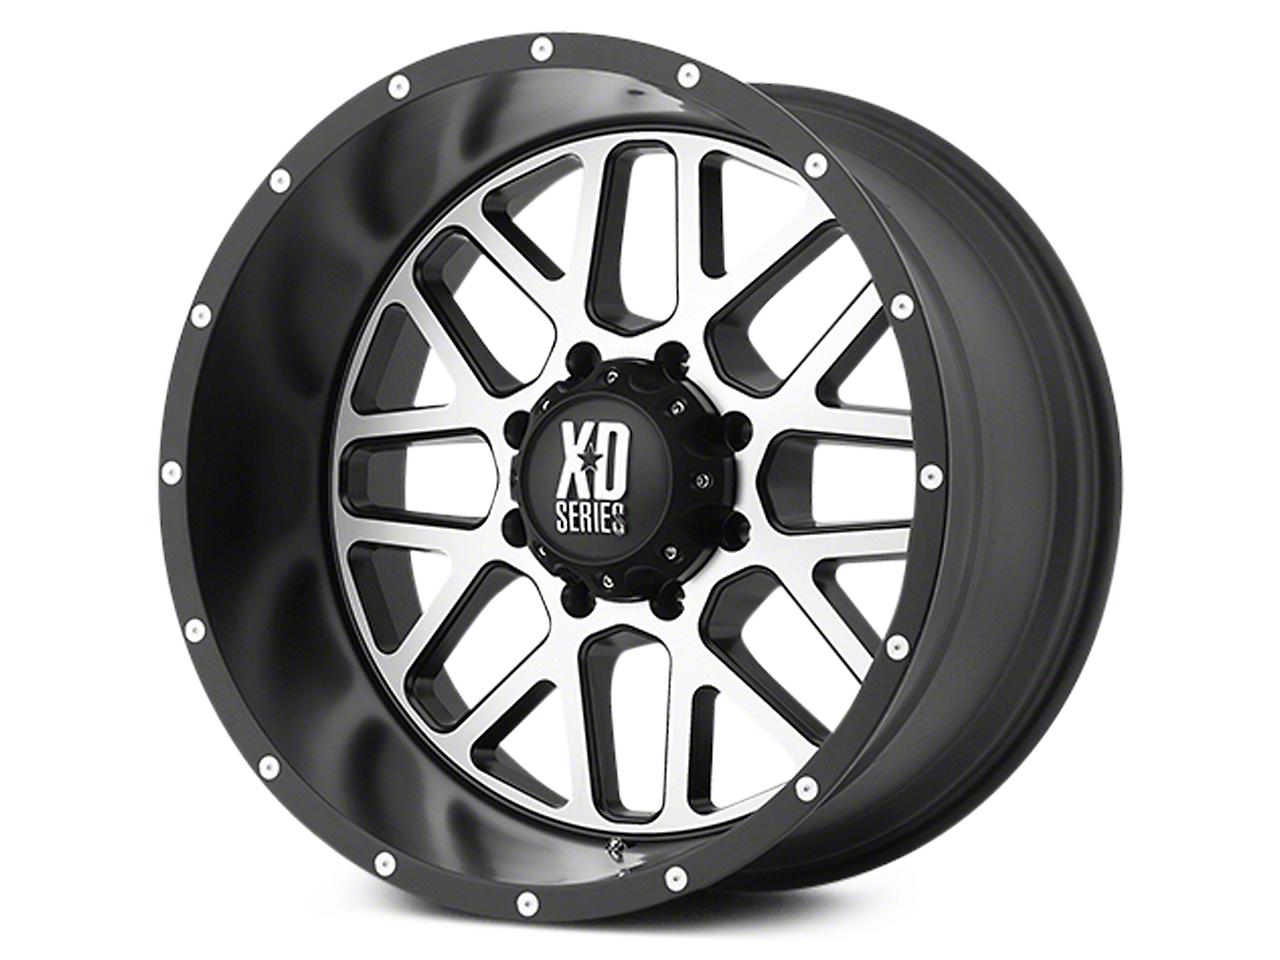 XD Grenade Satin Black Machined 6-Lug Wheel - 22x9.5 (07-18 Sierra 1500)